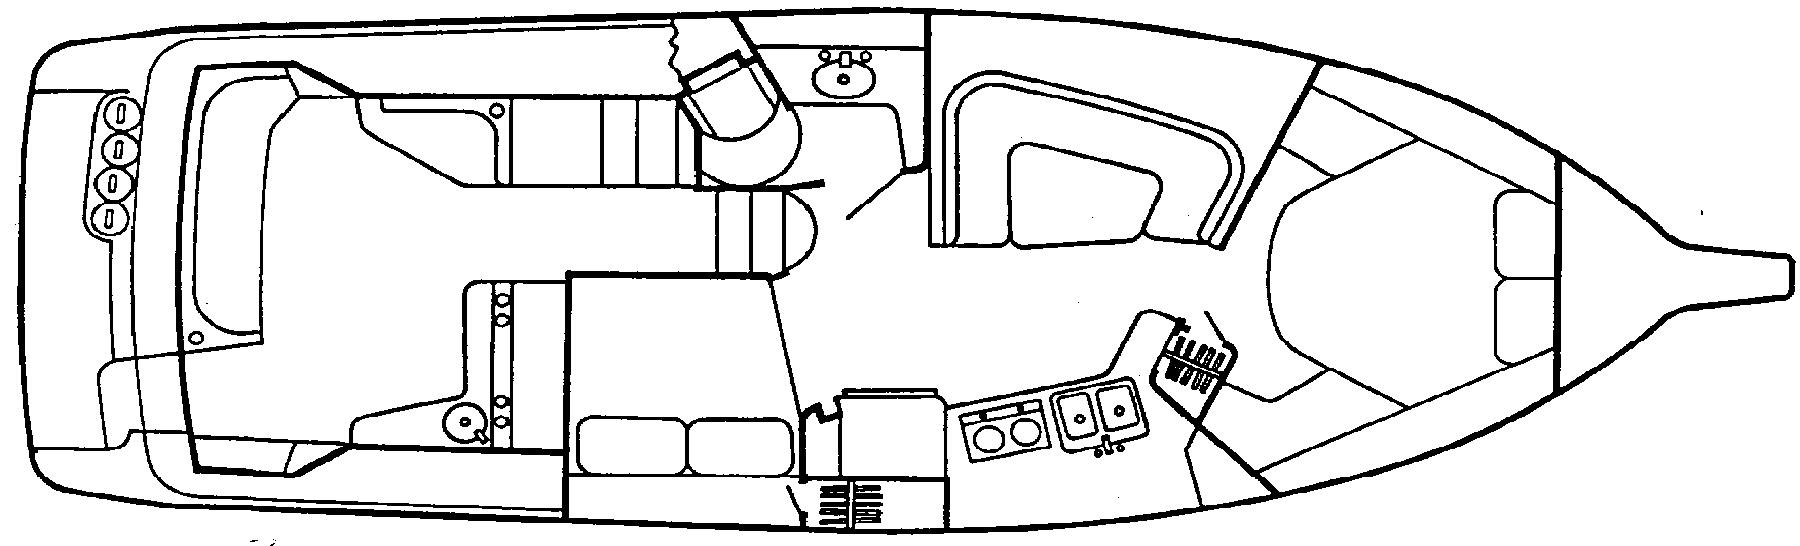 3670 Esprit; 3675-3775 Esprit Floor Plan 2